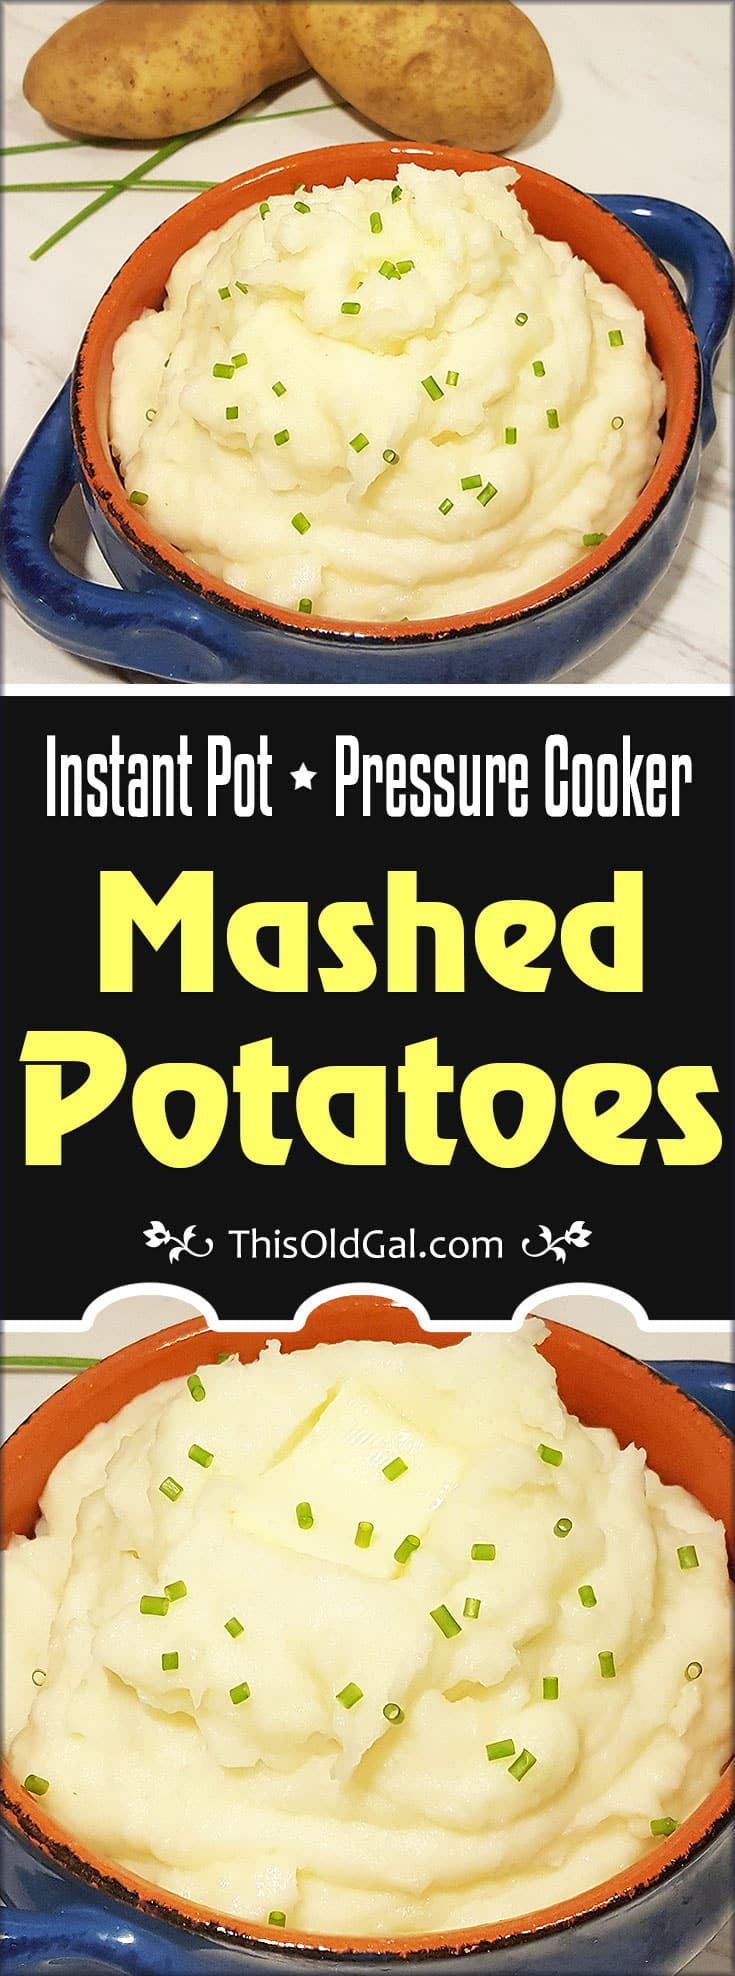 Pressure Cooker Instant Pot Mashed Potatoes